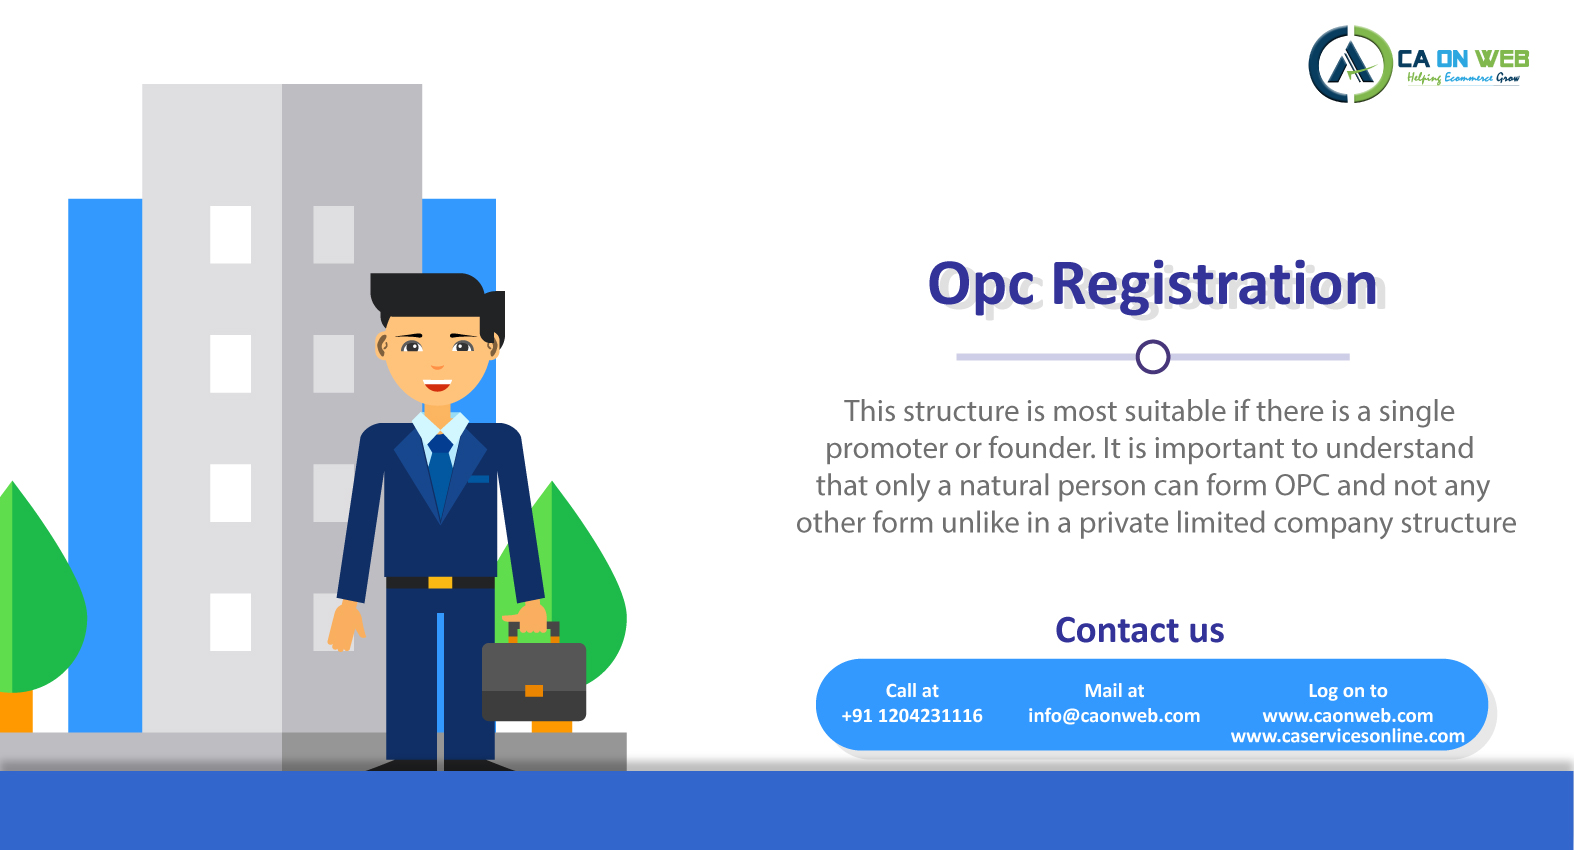 opc registration